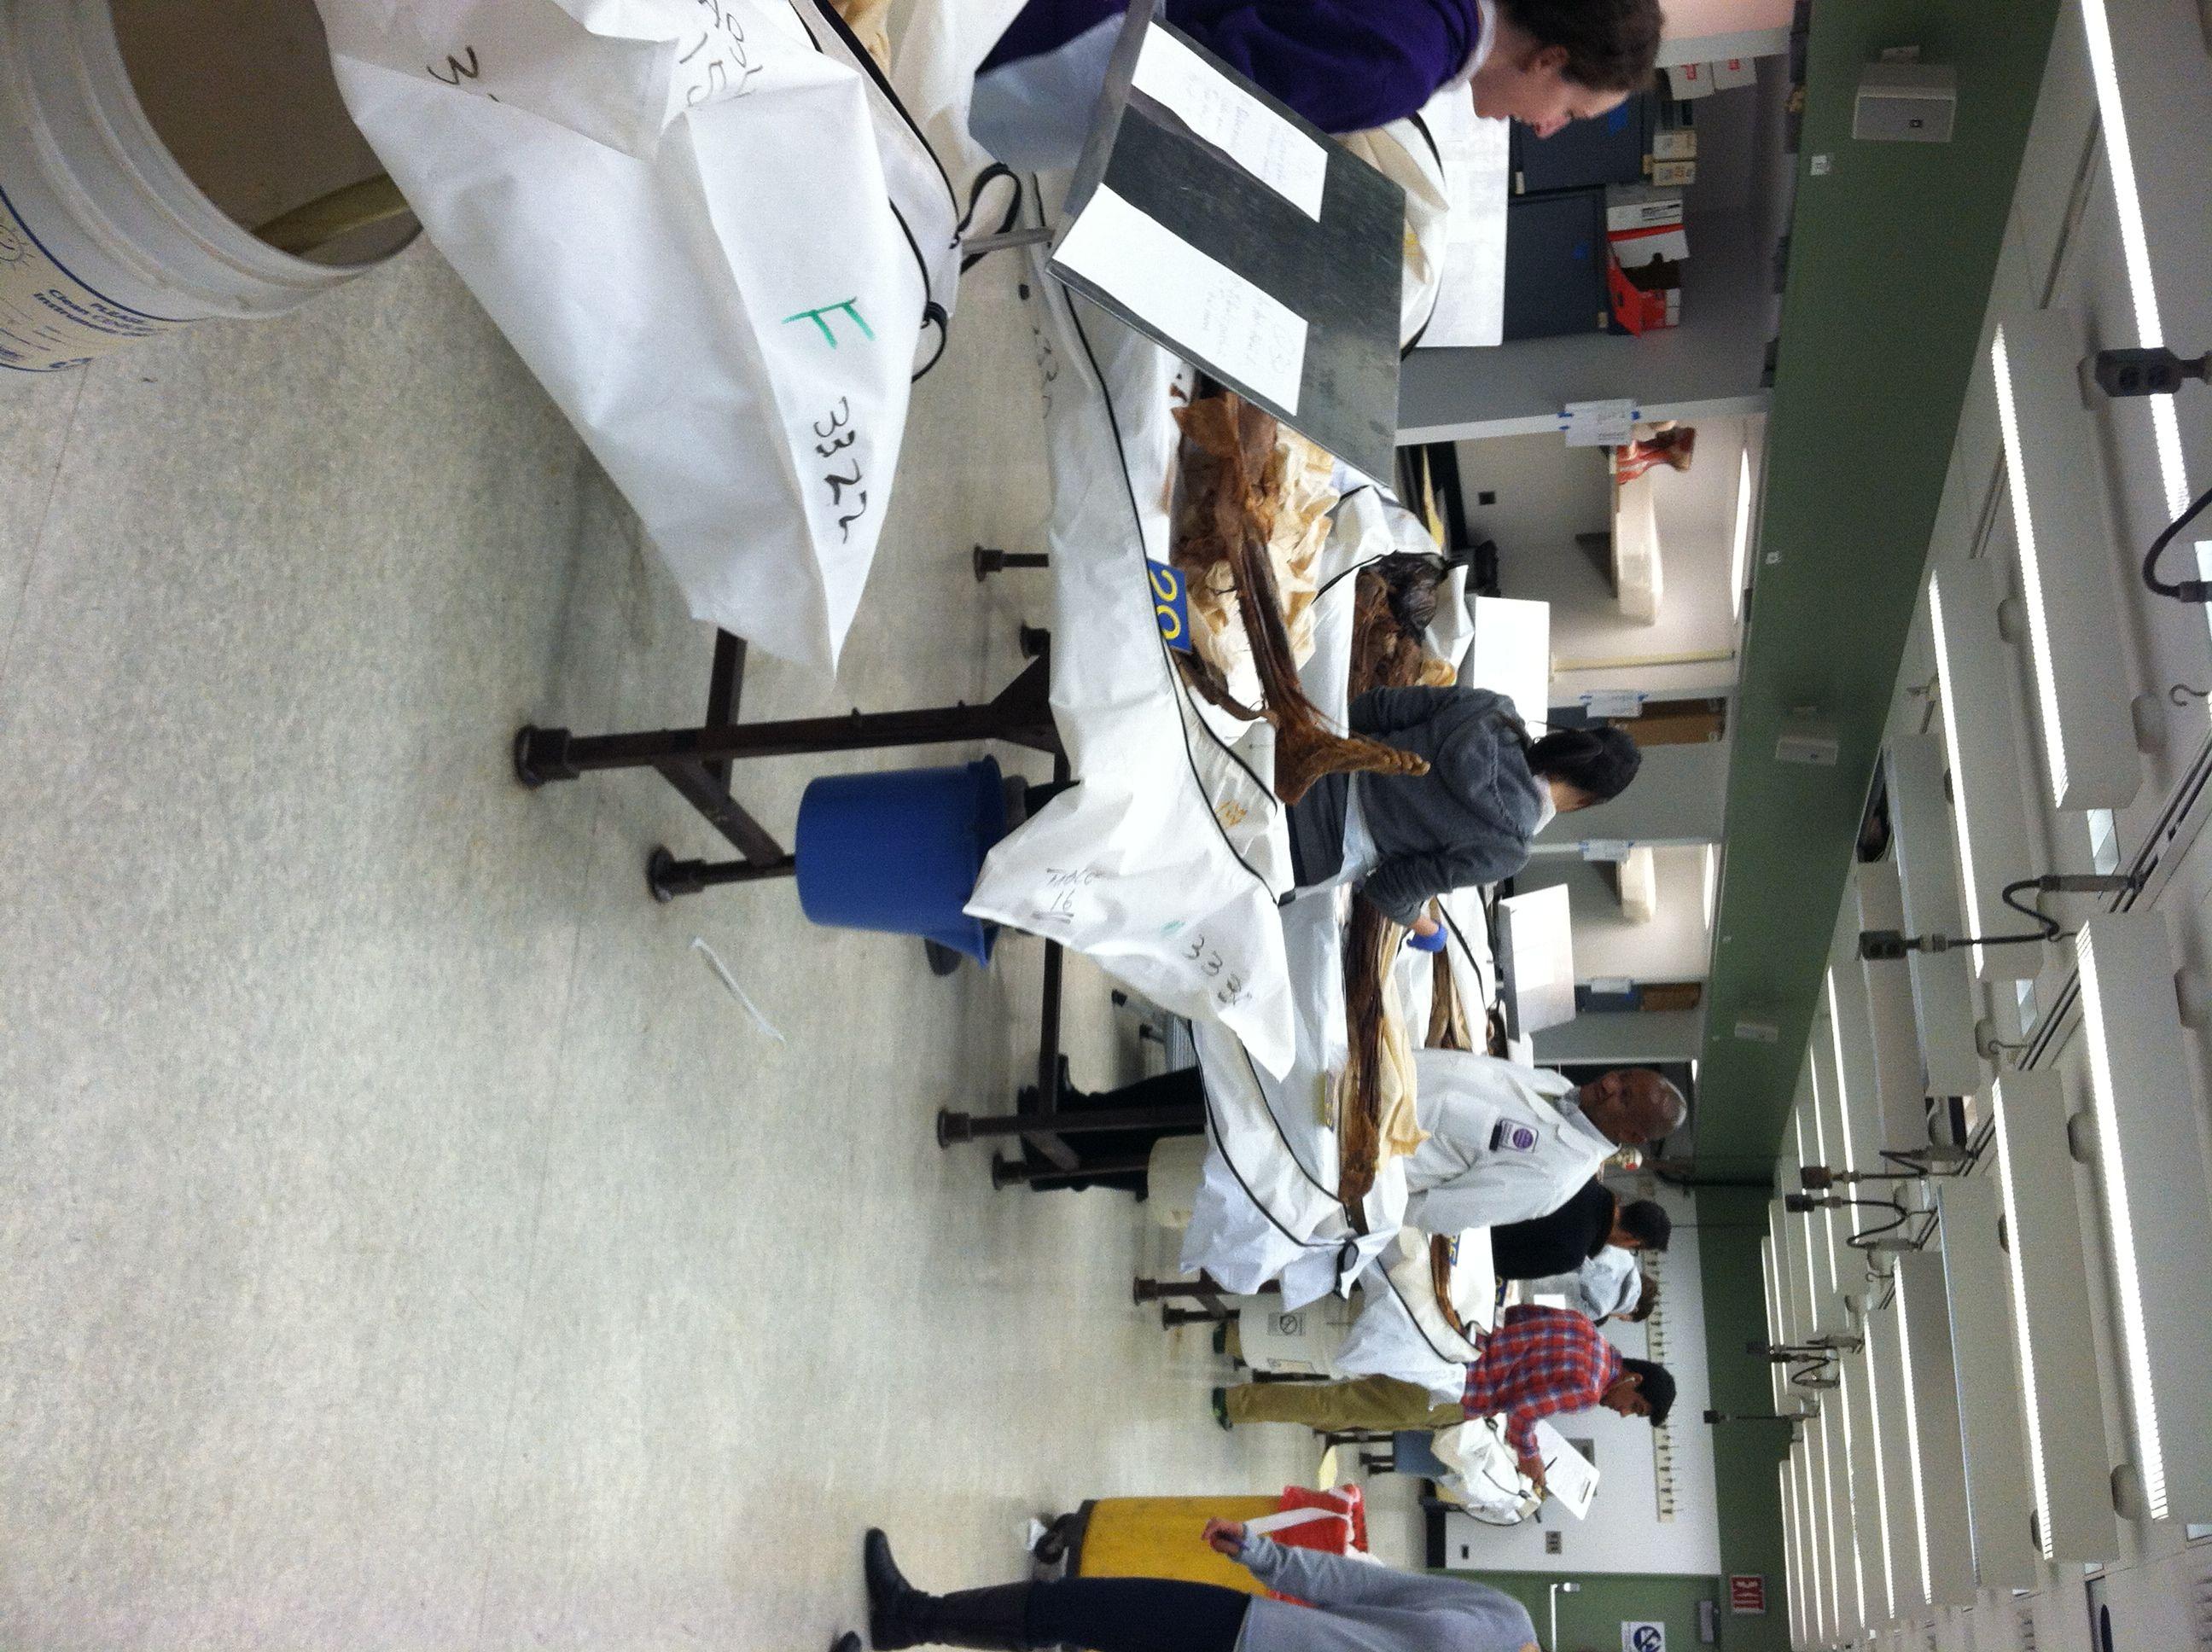 Inside a Gross Anatomy Lab: The Human Body as Textbook | Gross ...